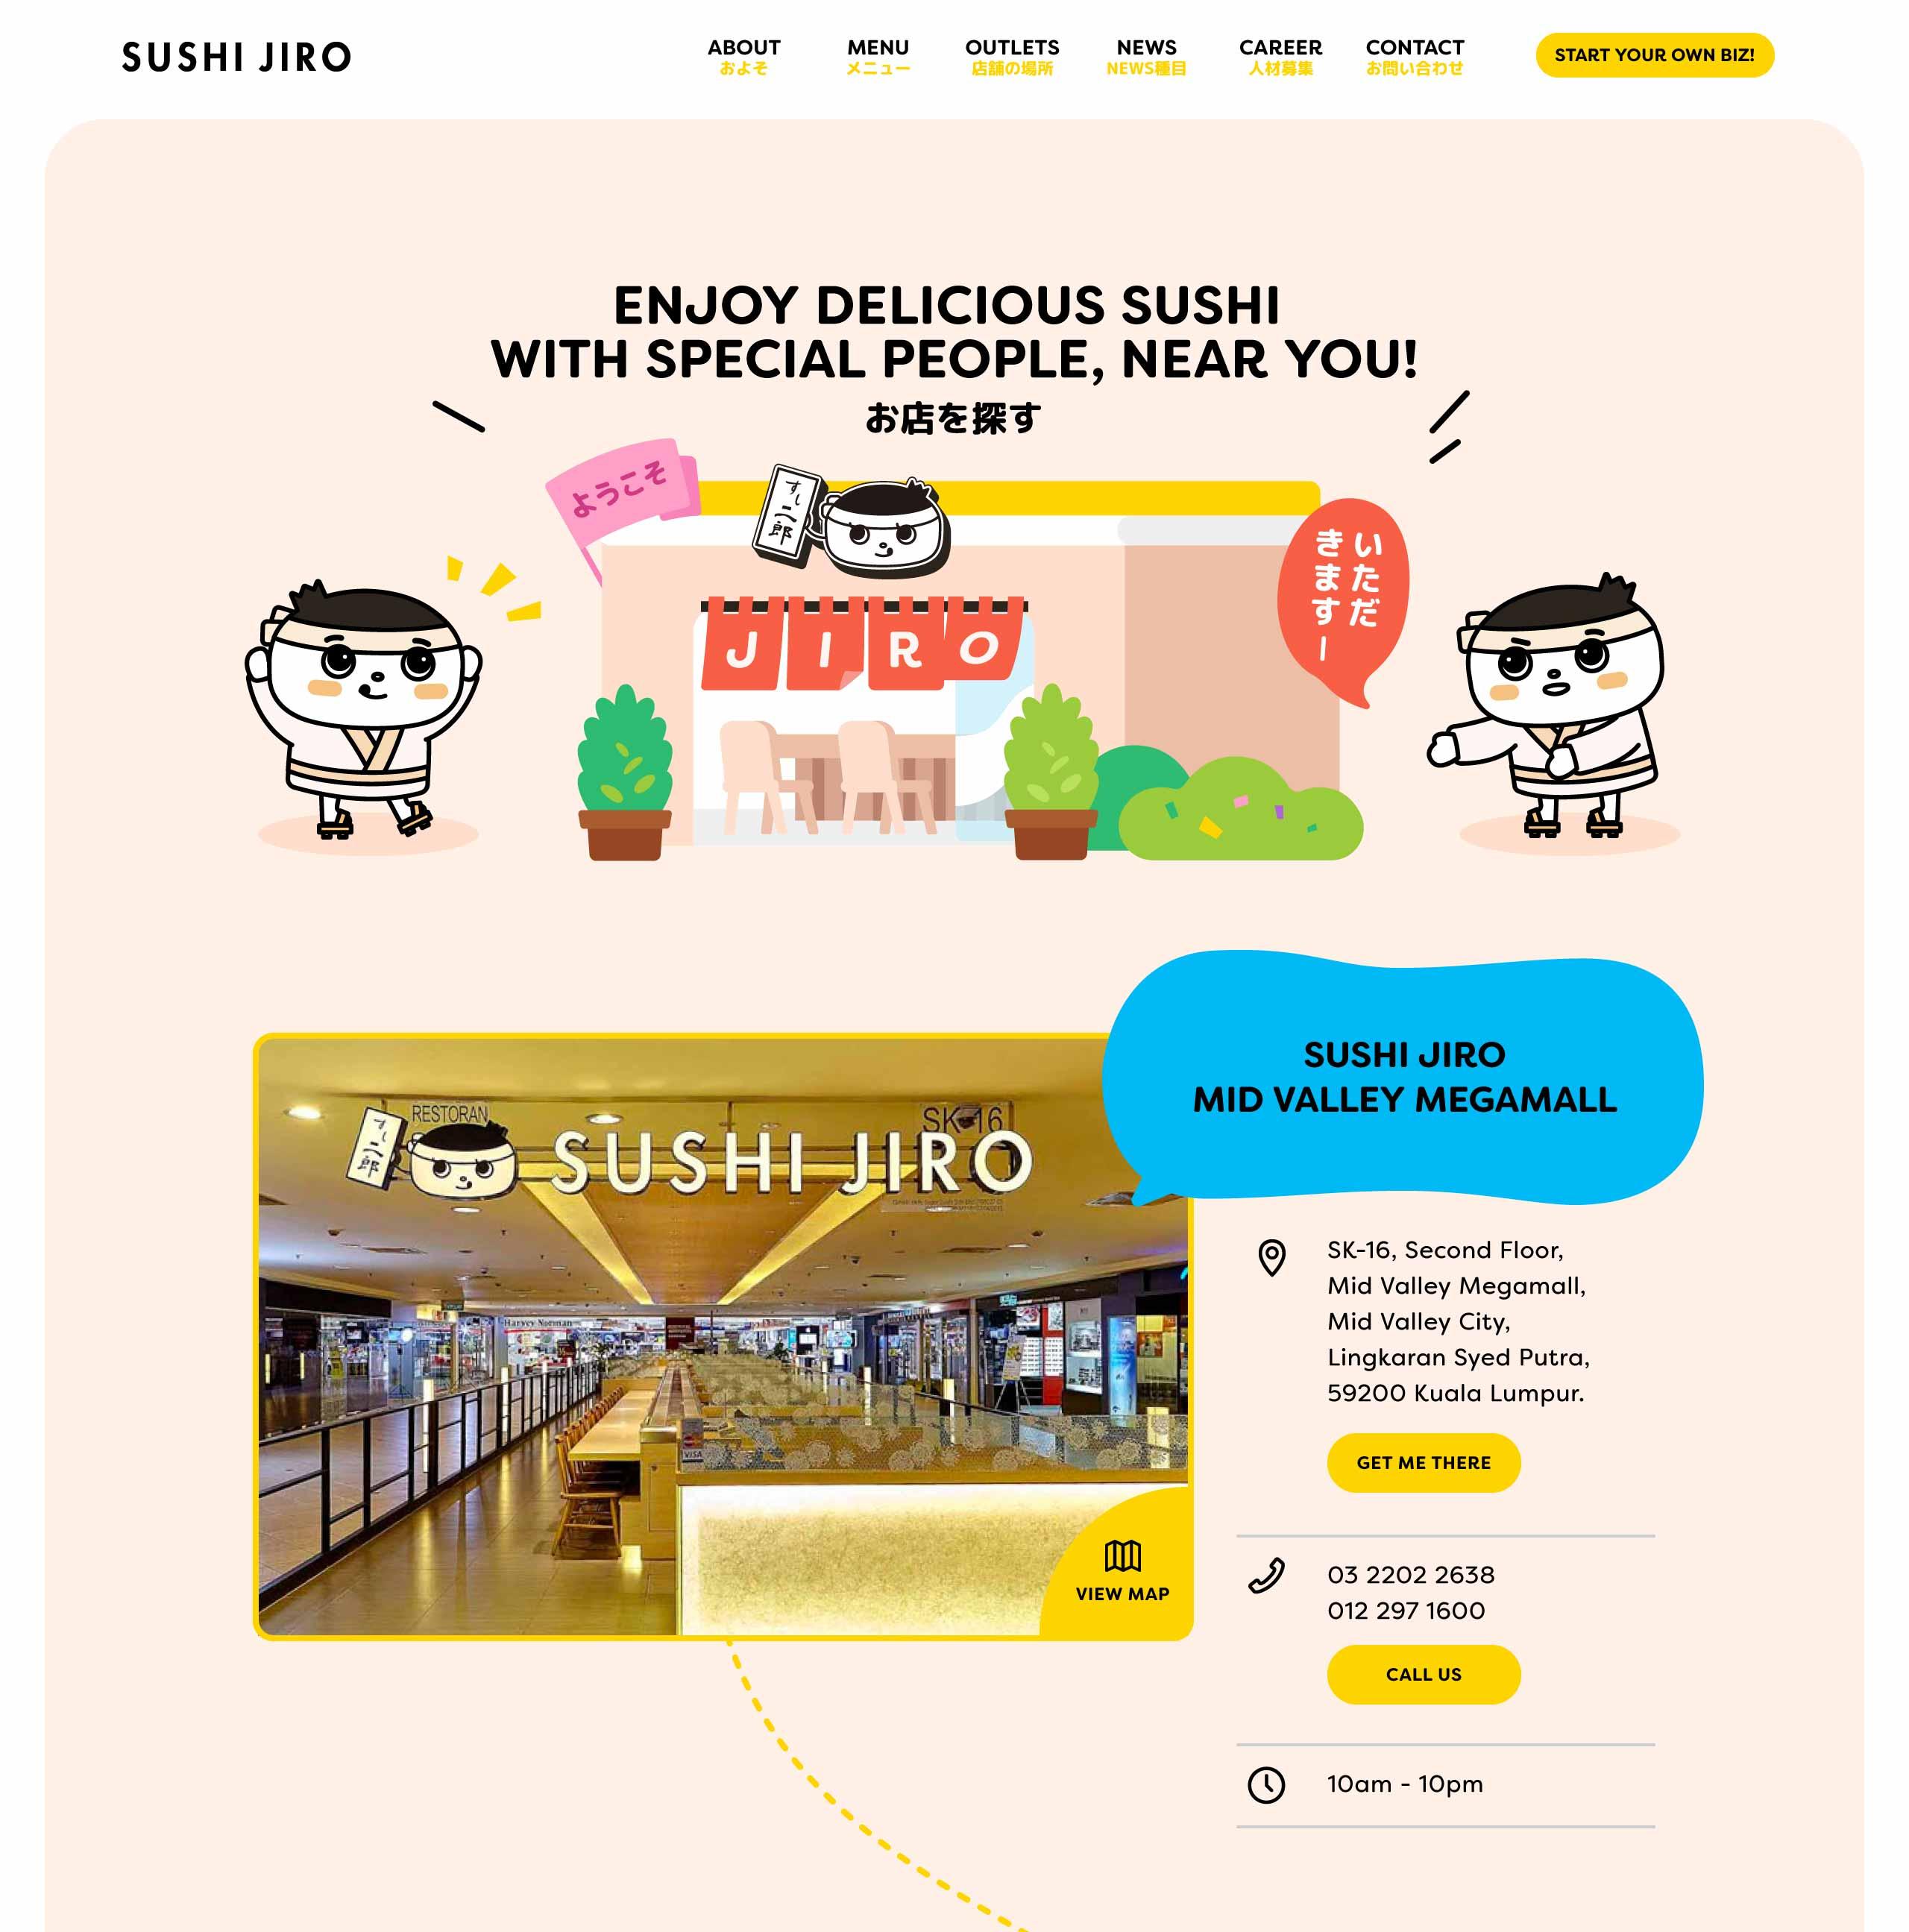 sj-web-stores